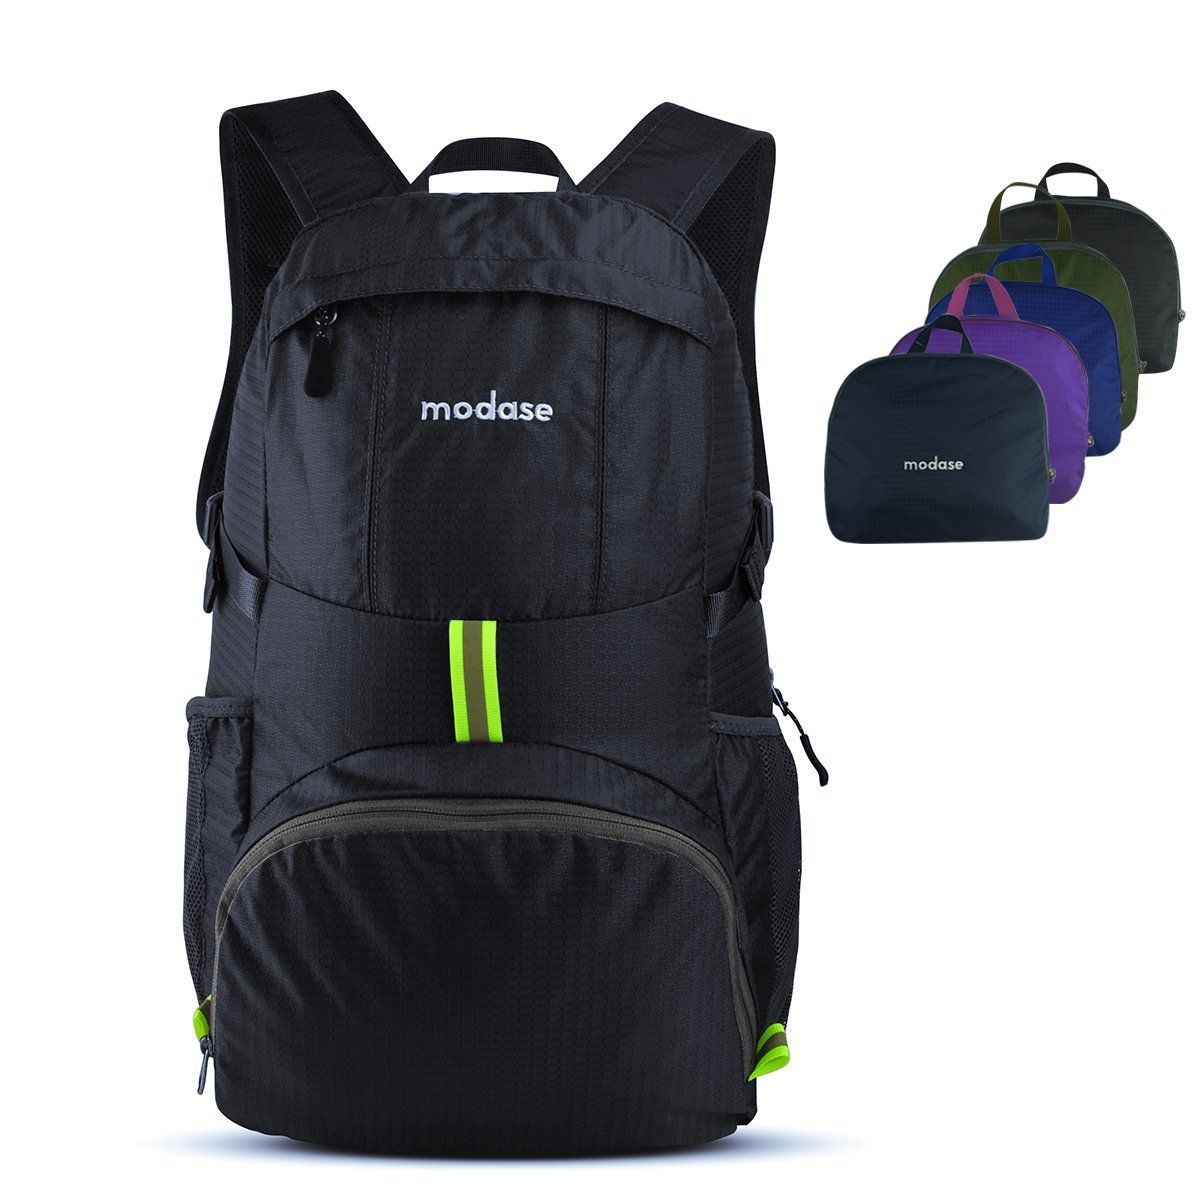 5fa55cba2f5d Best Travel Backpack 2017 Best Travel Backpack 2018 backpack travel backpack  best backpacks laptop backpack cool backpacks backpacks for men best  backpack ...